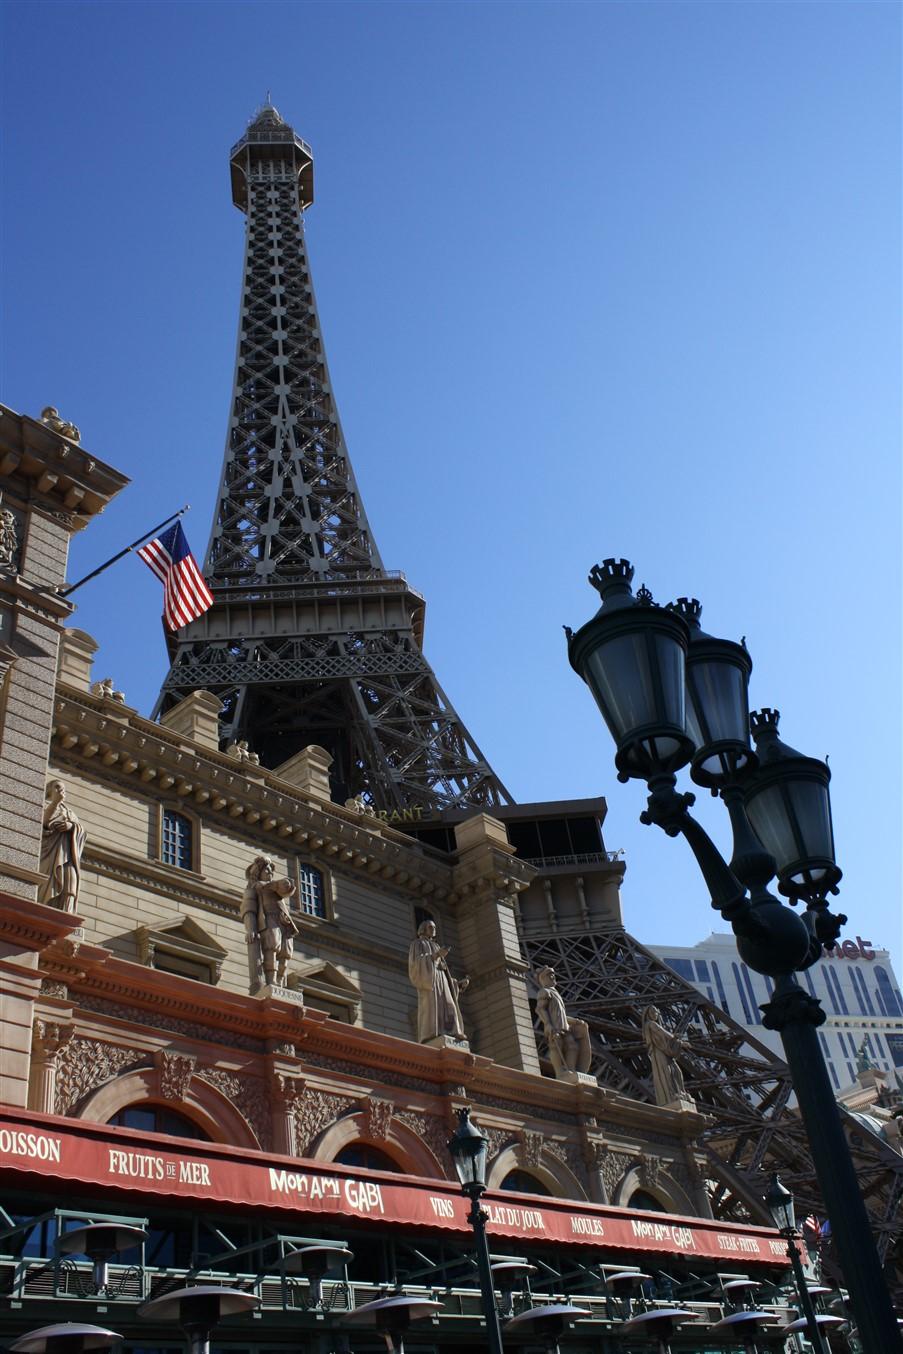 2011 12 04 Las Vegas 4.jpg